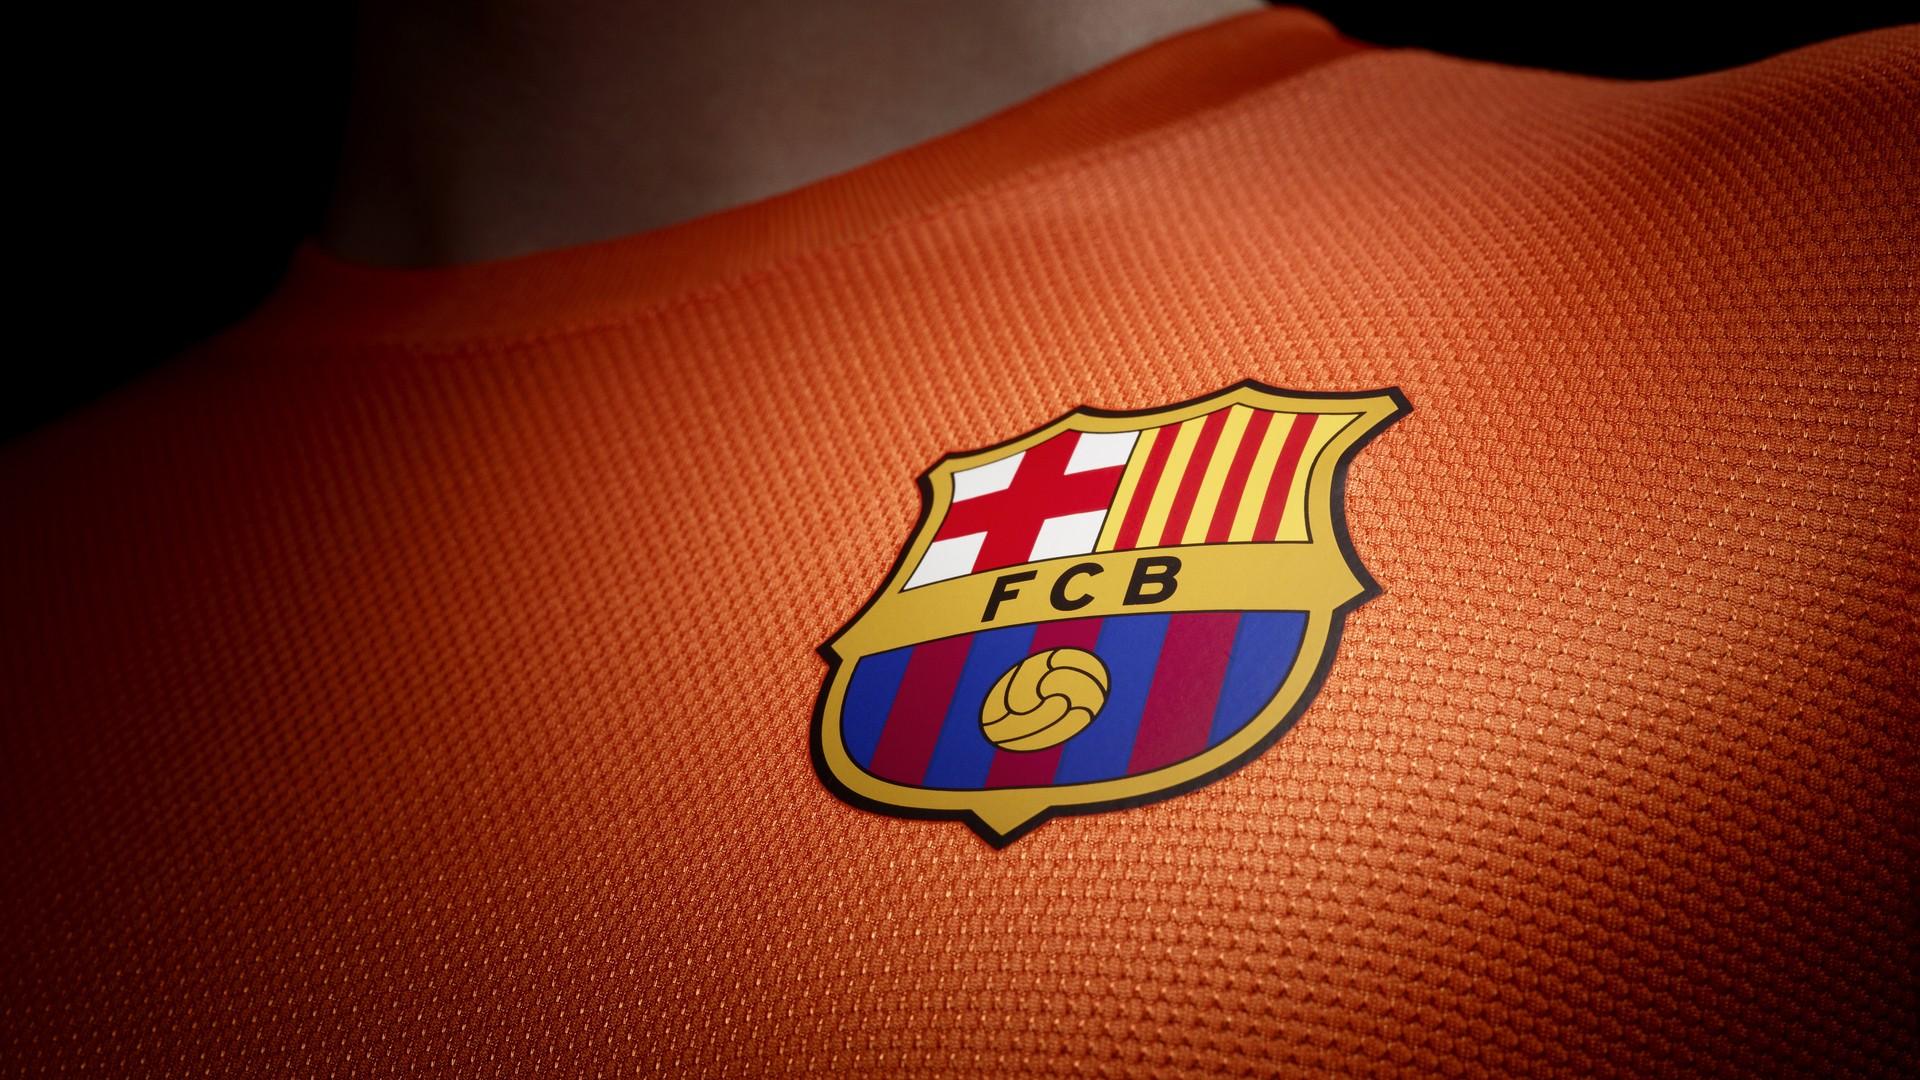 Barcelona-Jersey-Patch-wallpaper-wp3402854